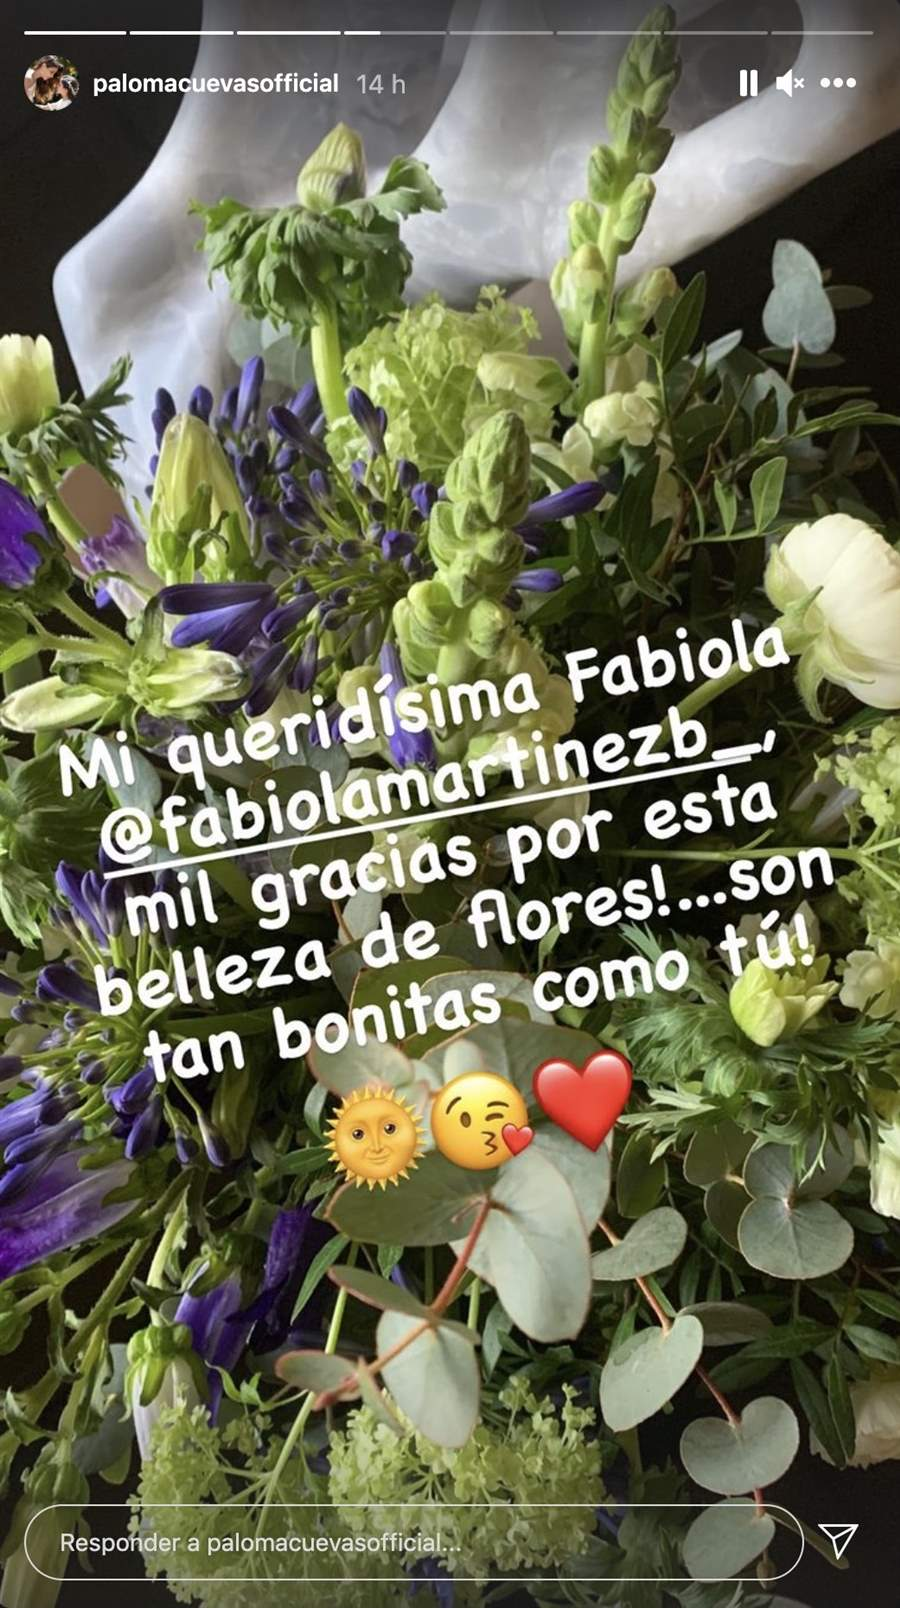 flores-fabiola-paloma-cuevas.jpg